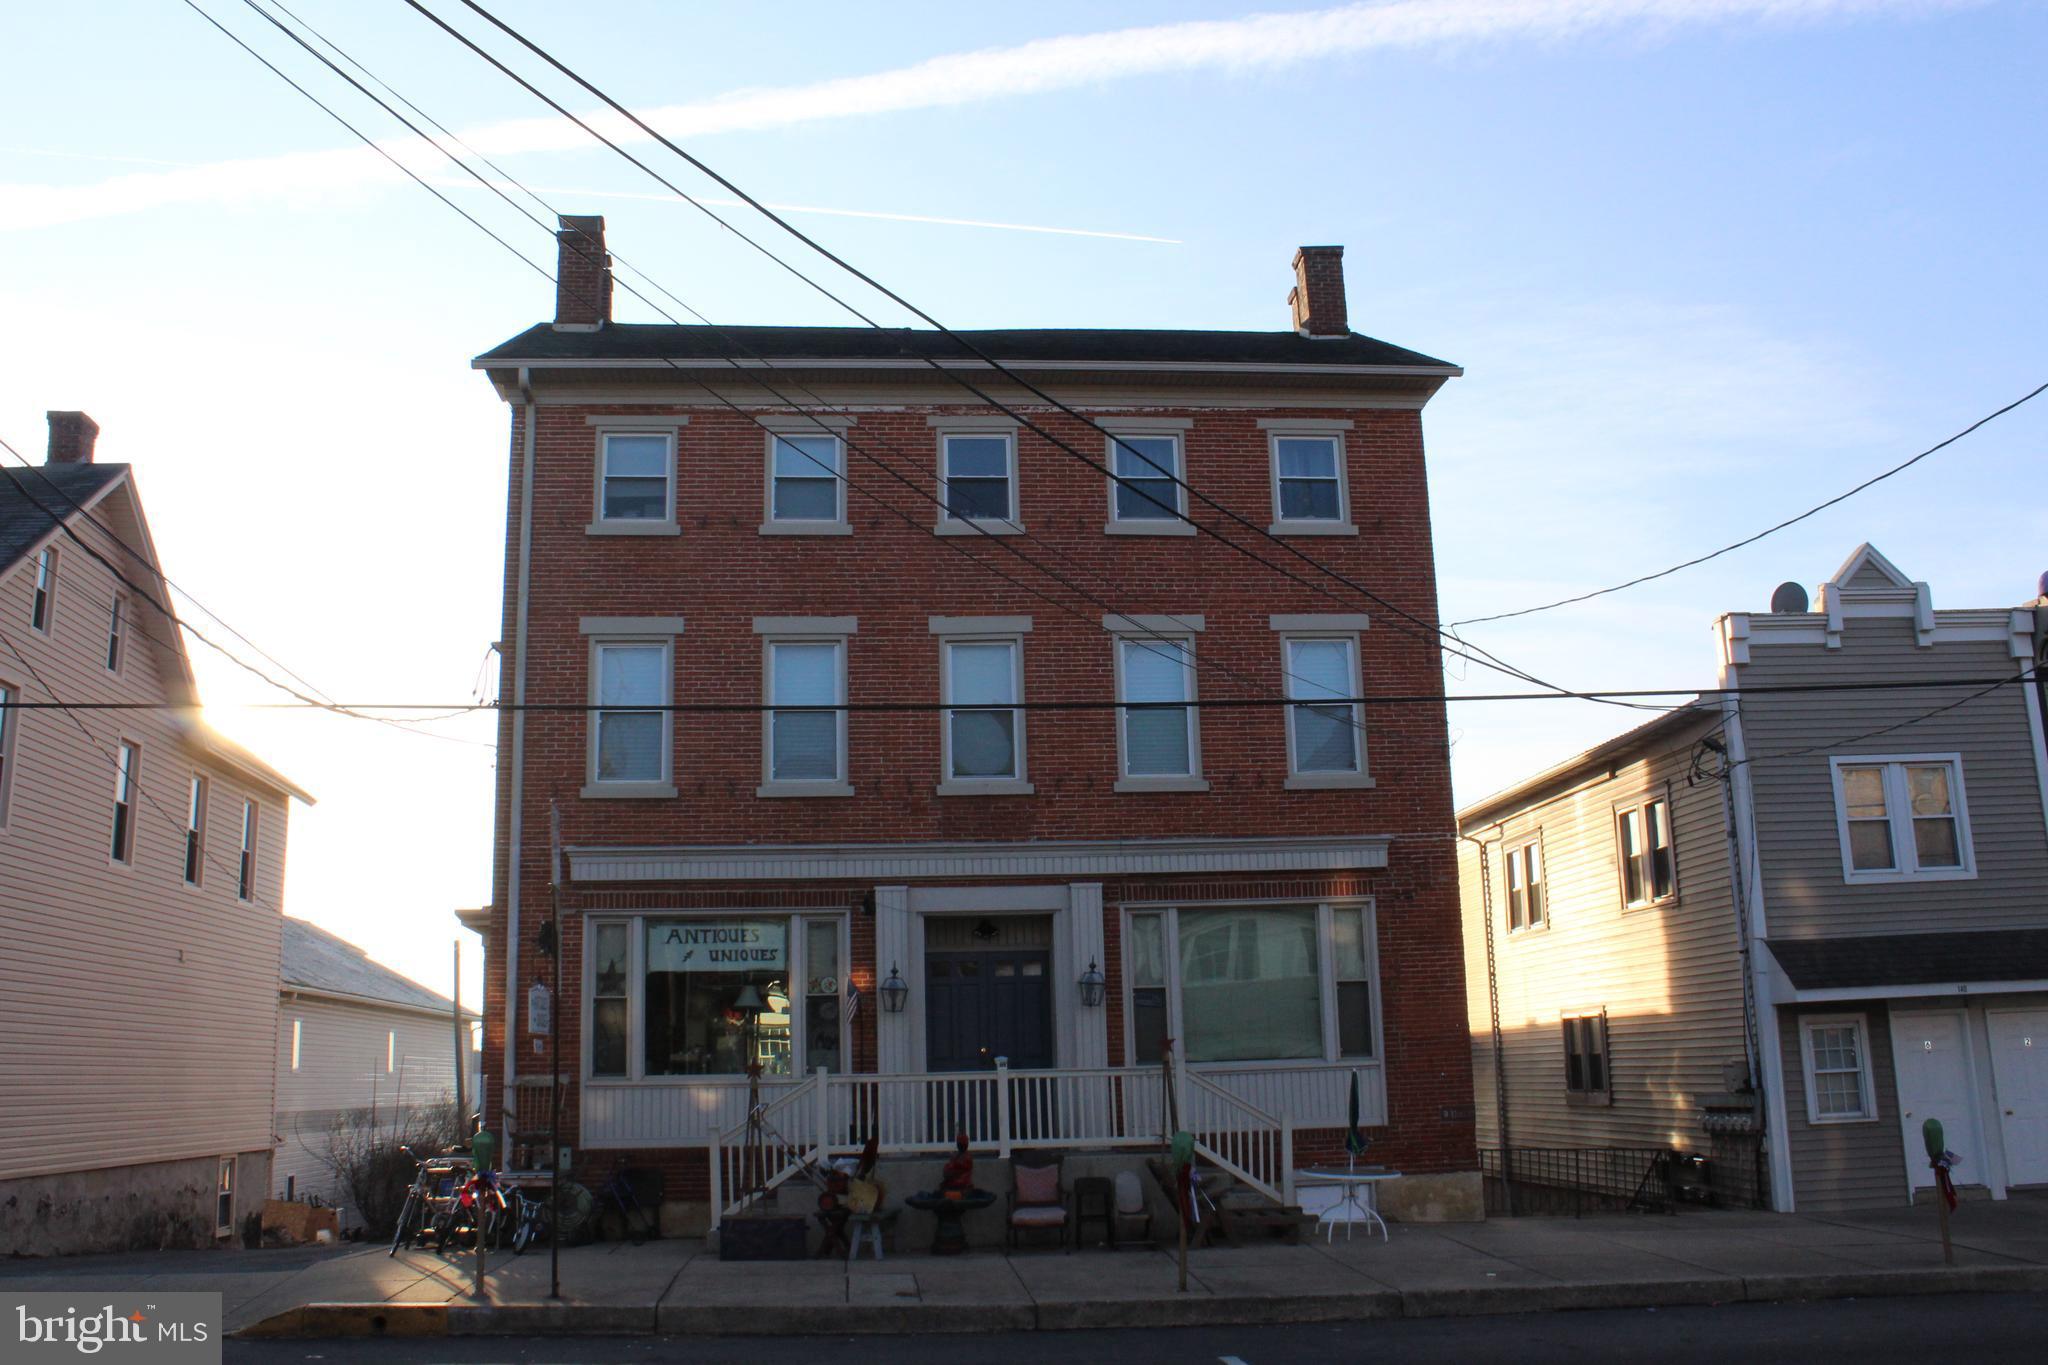 142 E MAIN STREET, NEW HOLLAND, PA 17557